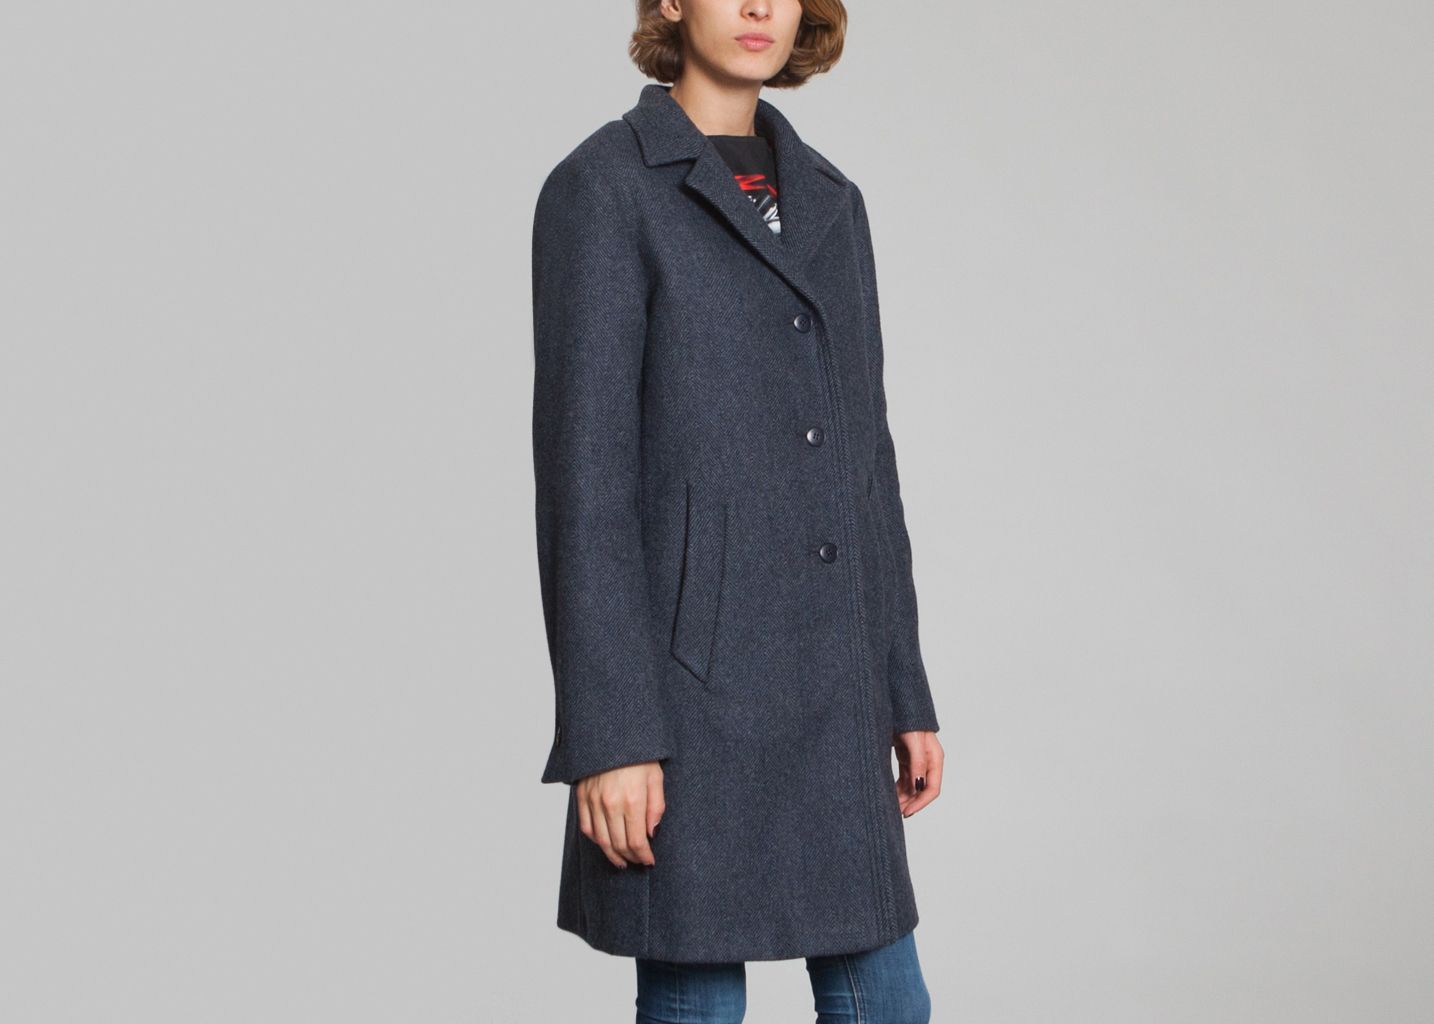 Manteau hiver femme sport expert